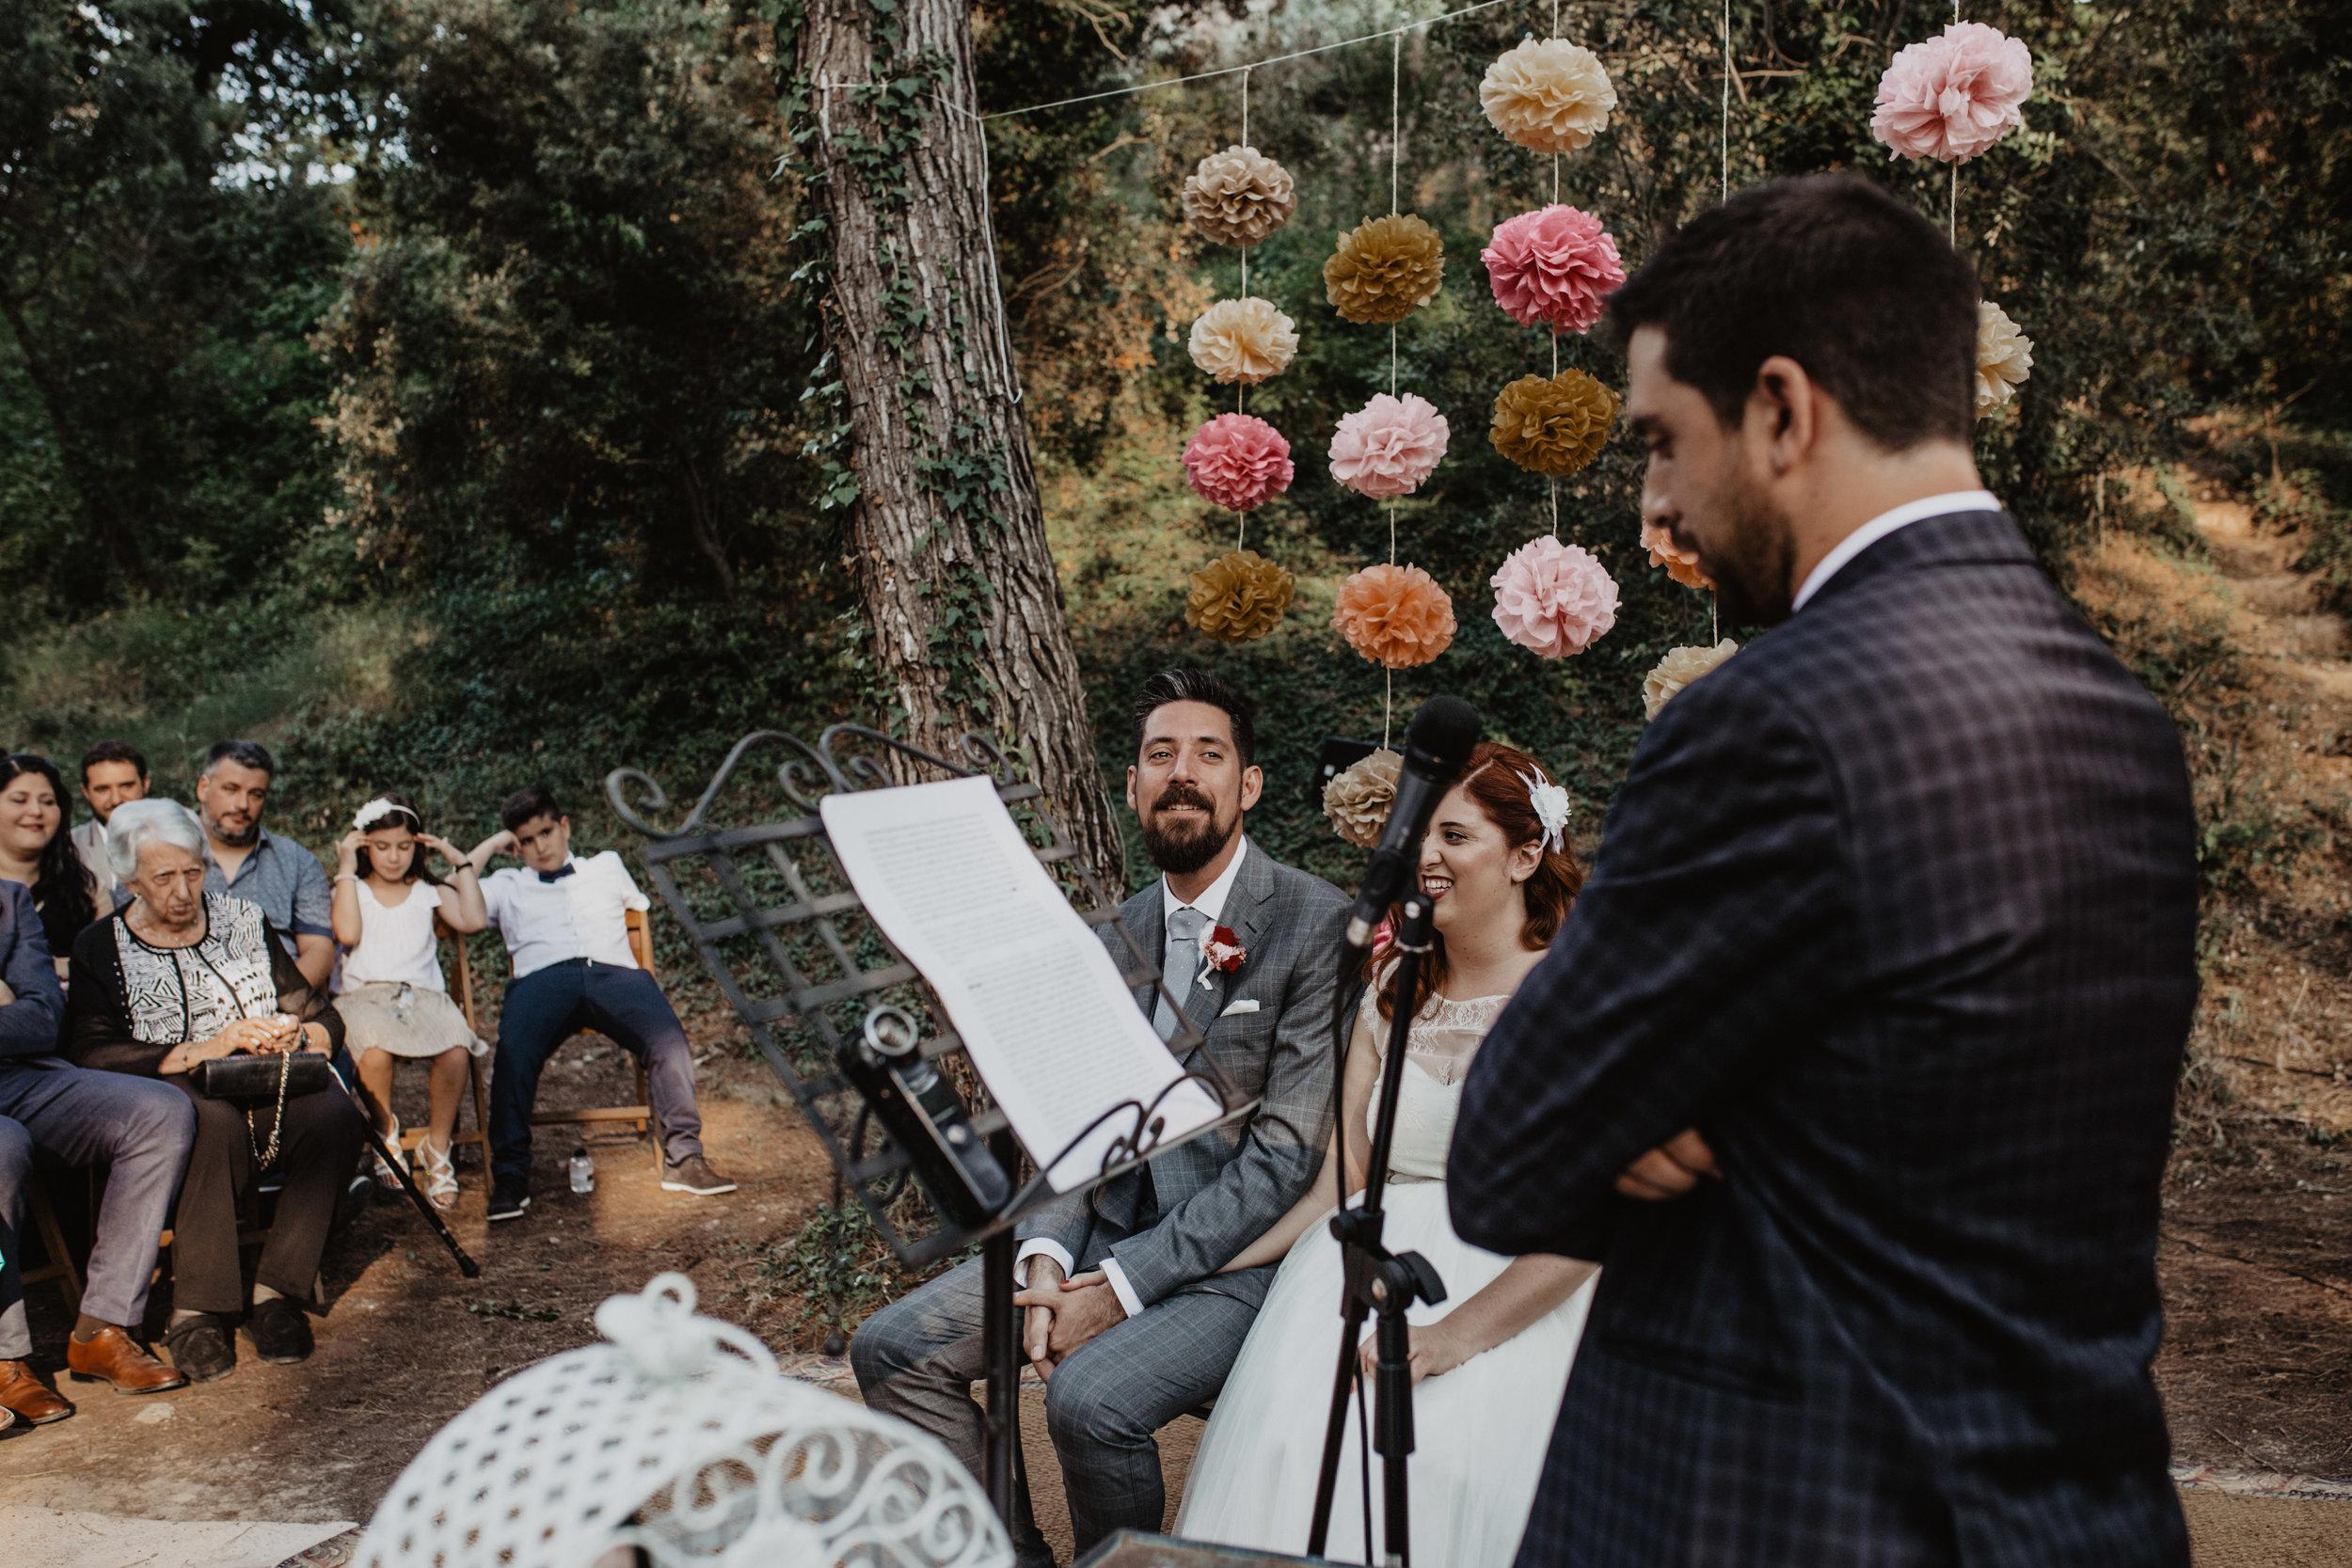 thenortherngirlphotography_photography_thenortherngirl_rebeccascabros_wedding_weddingphotography_masialagarrigadecastelladral_joaniemma_bodaenbarcelona_weddingphotographer_emmaijoan-356.jpg